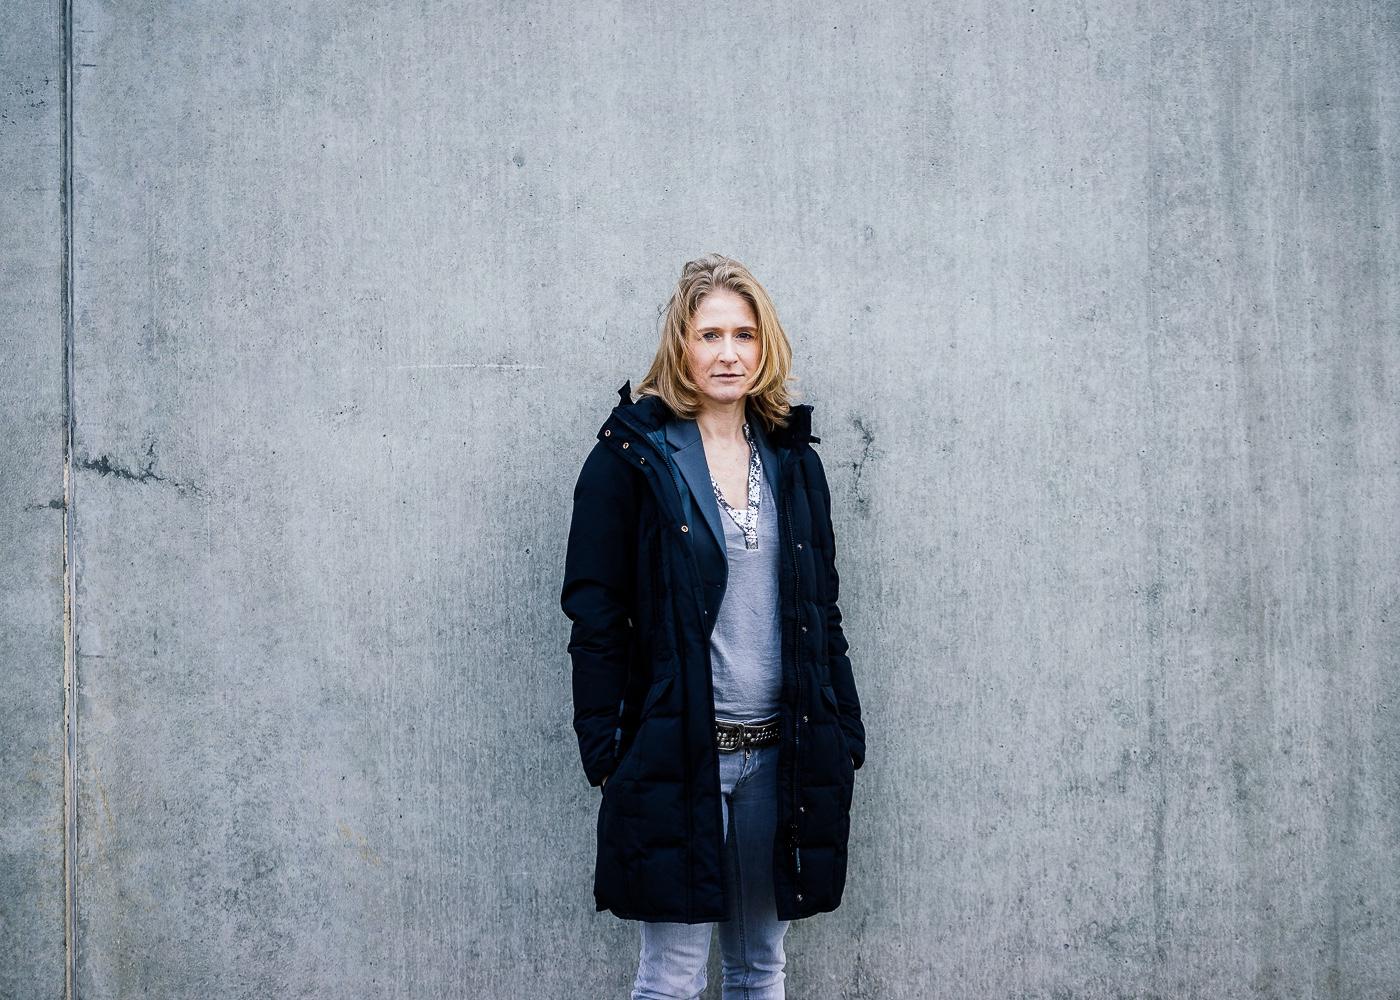 FelixGemein-People-Fotograf-20141129-0003-2